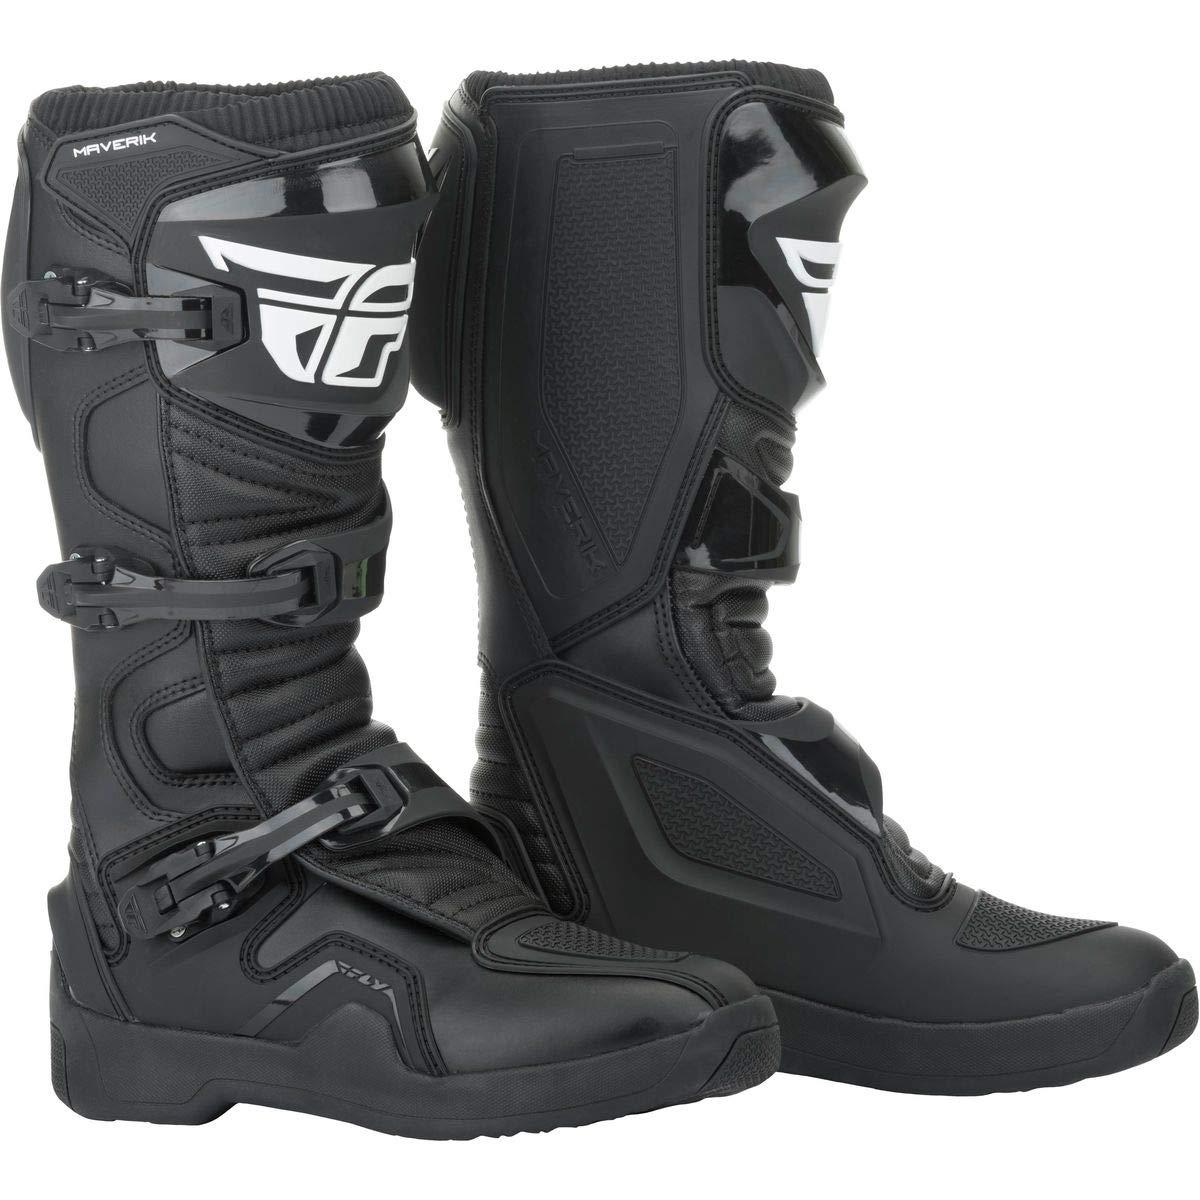 Fly 364-67110 Racing 2019 Maverik Motocross Boots US 10 Black (UK 9)